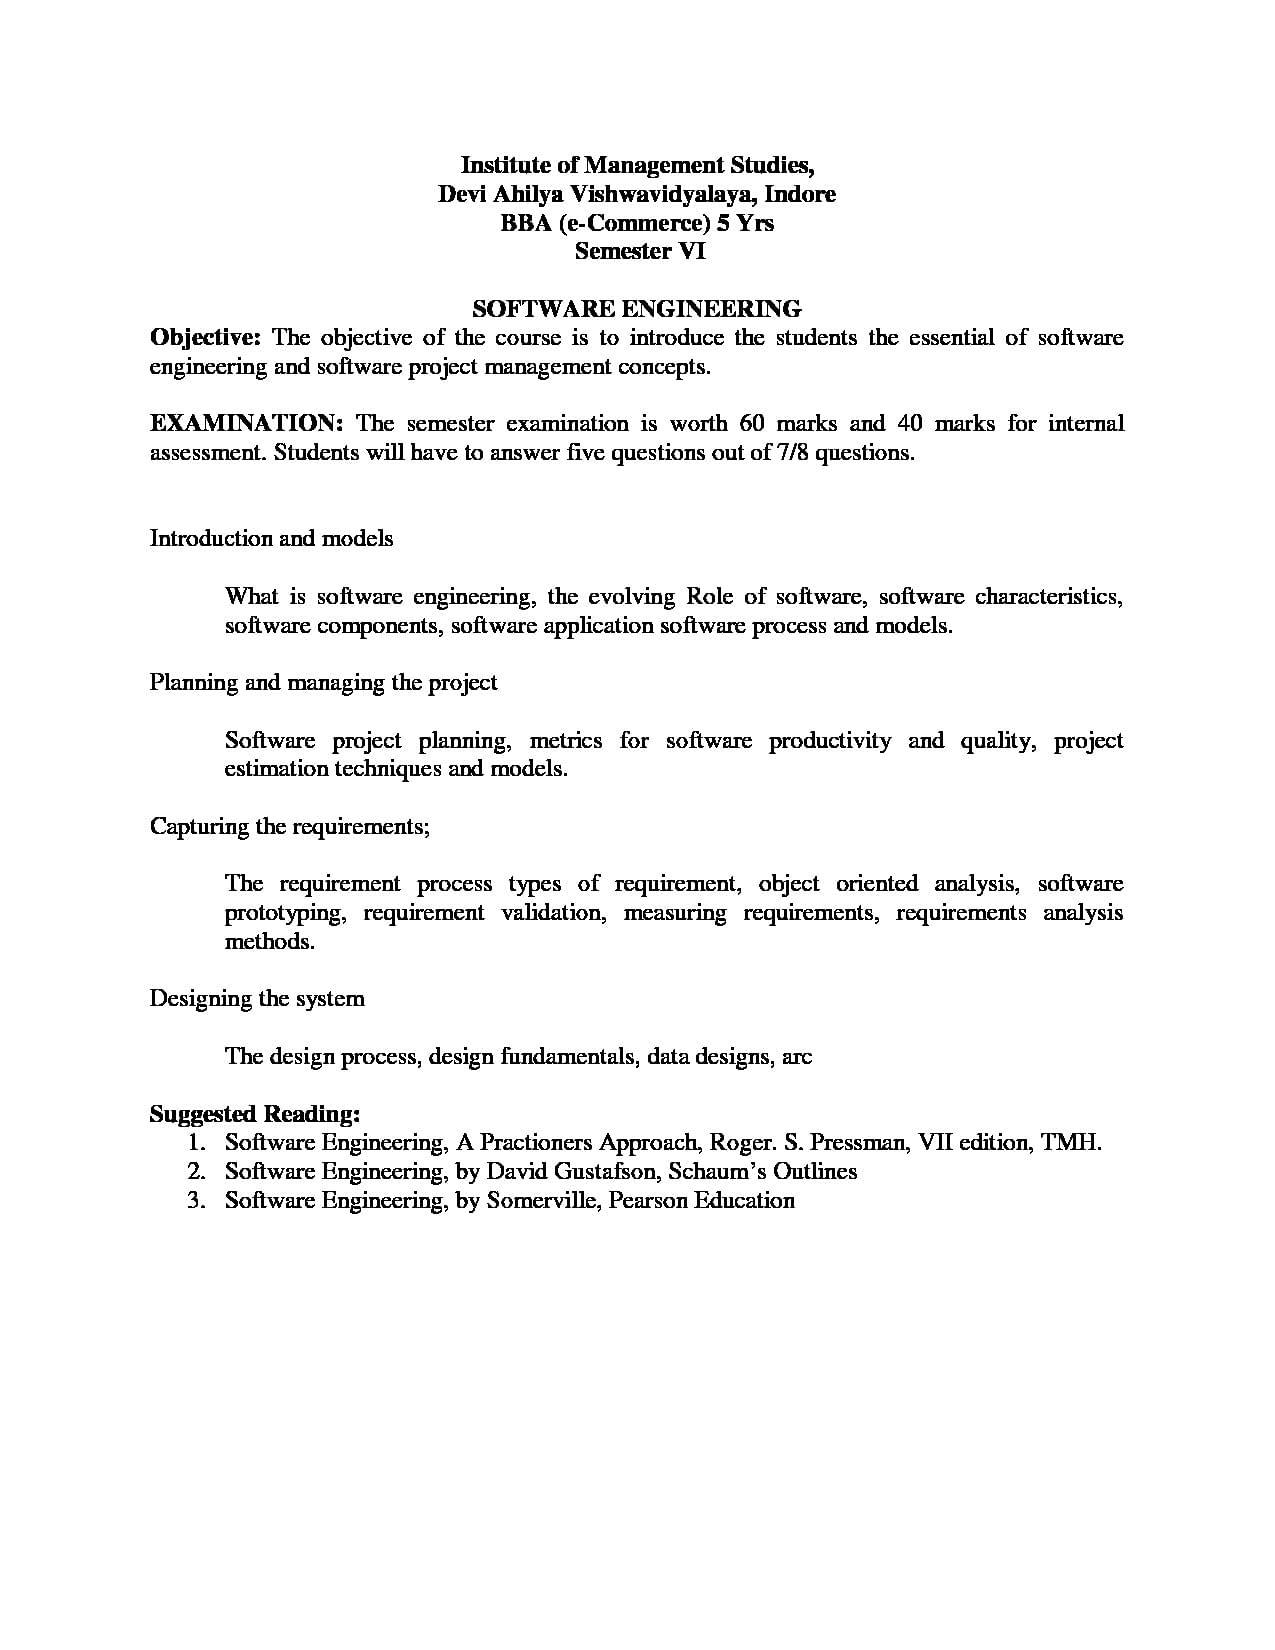 Institute of Management Studies, Devi Ahilya Vishwavidyalaya - [IMS